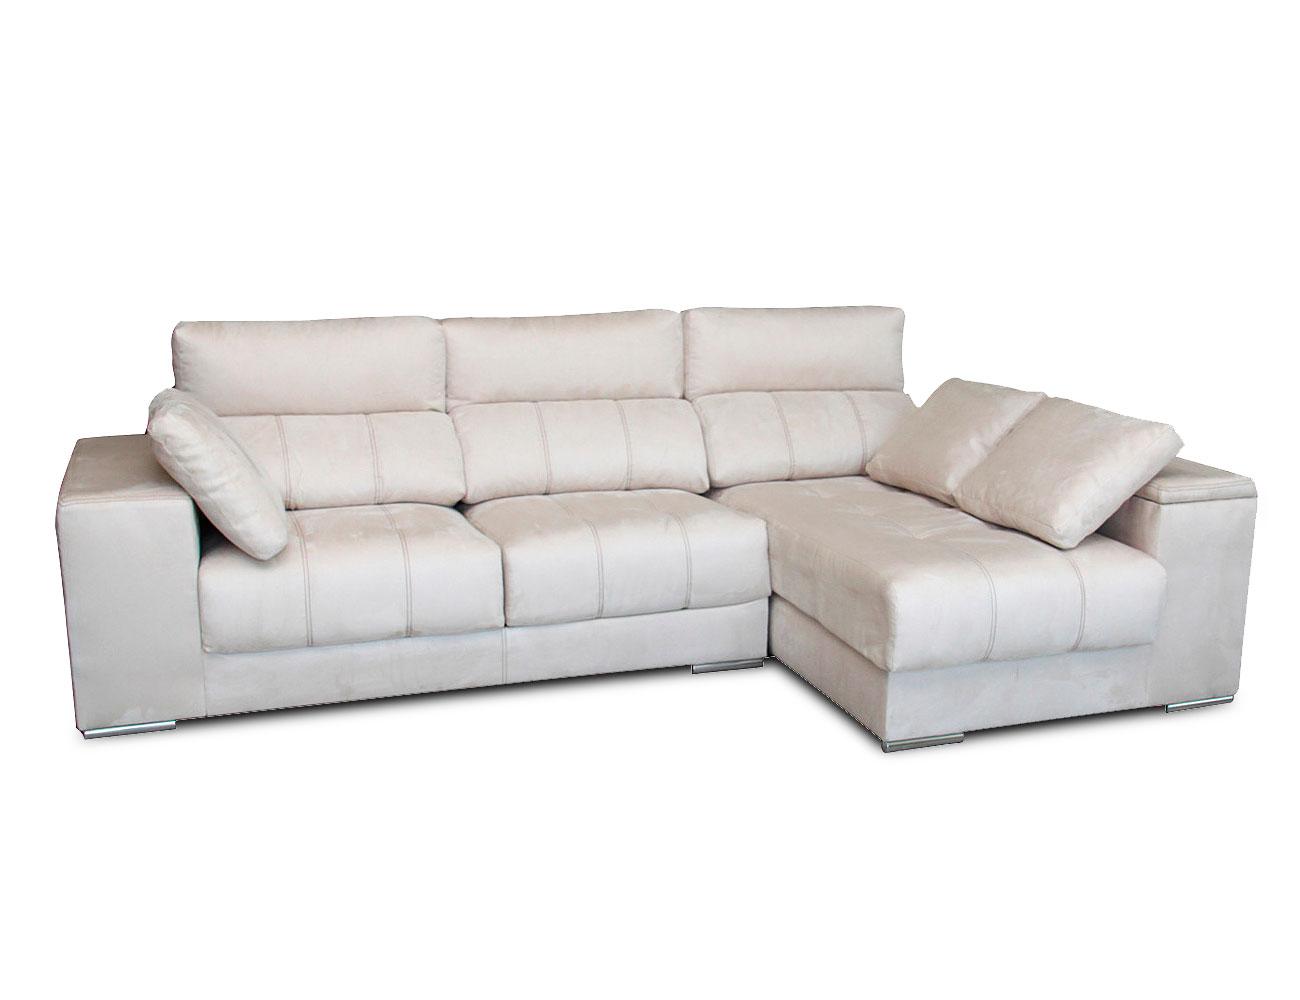 Sofa chaiselongue 3 taburetes arcon